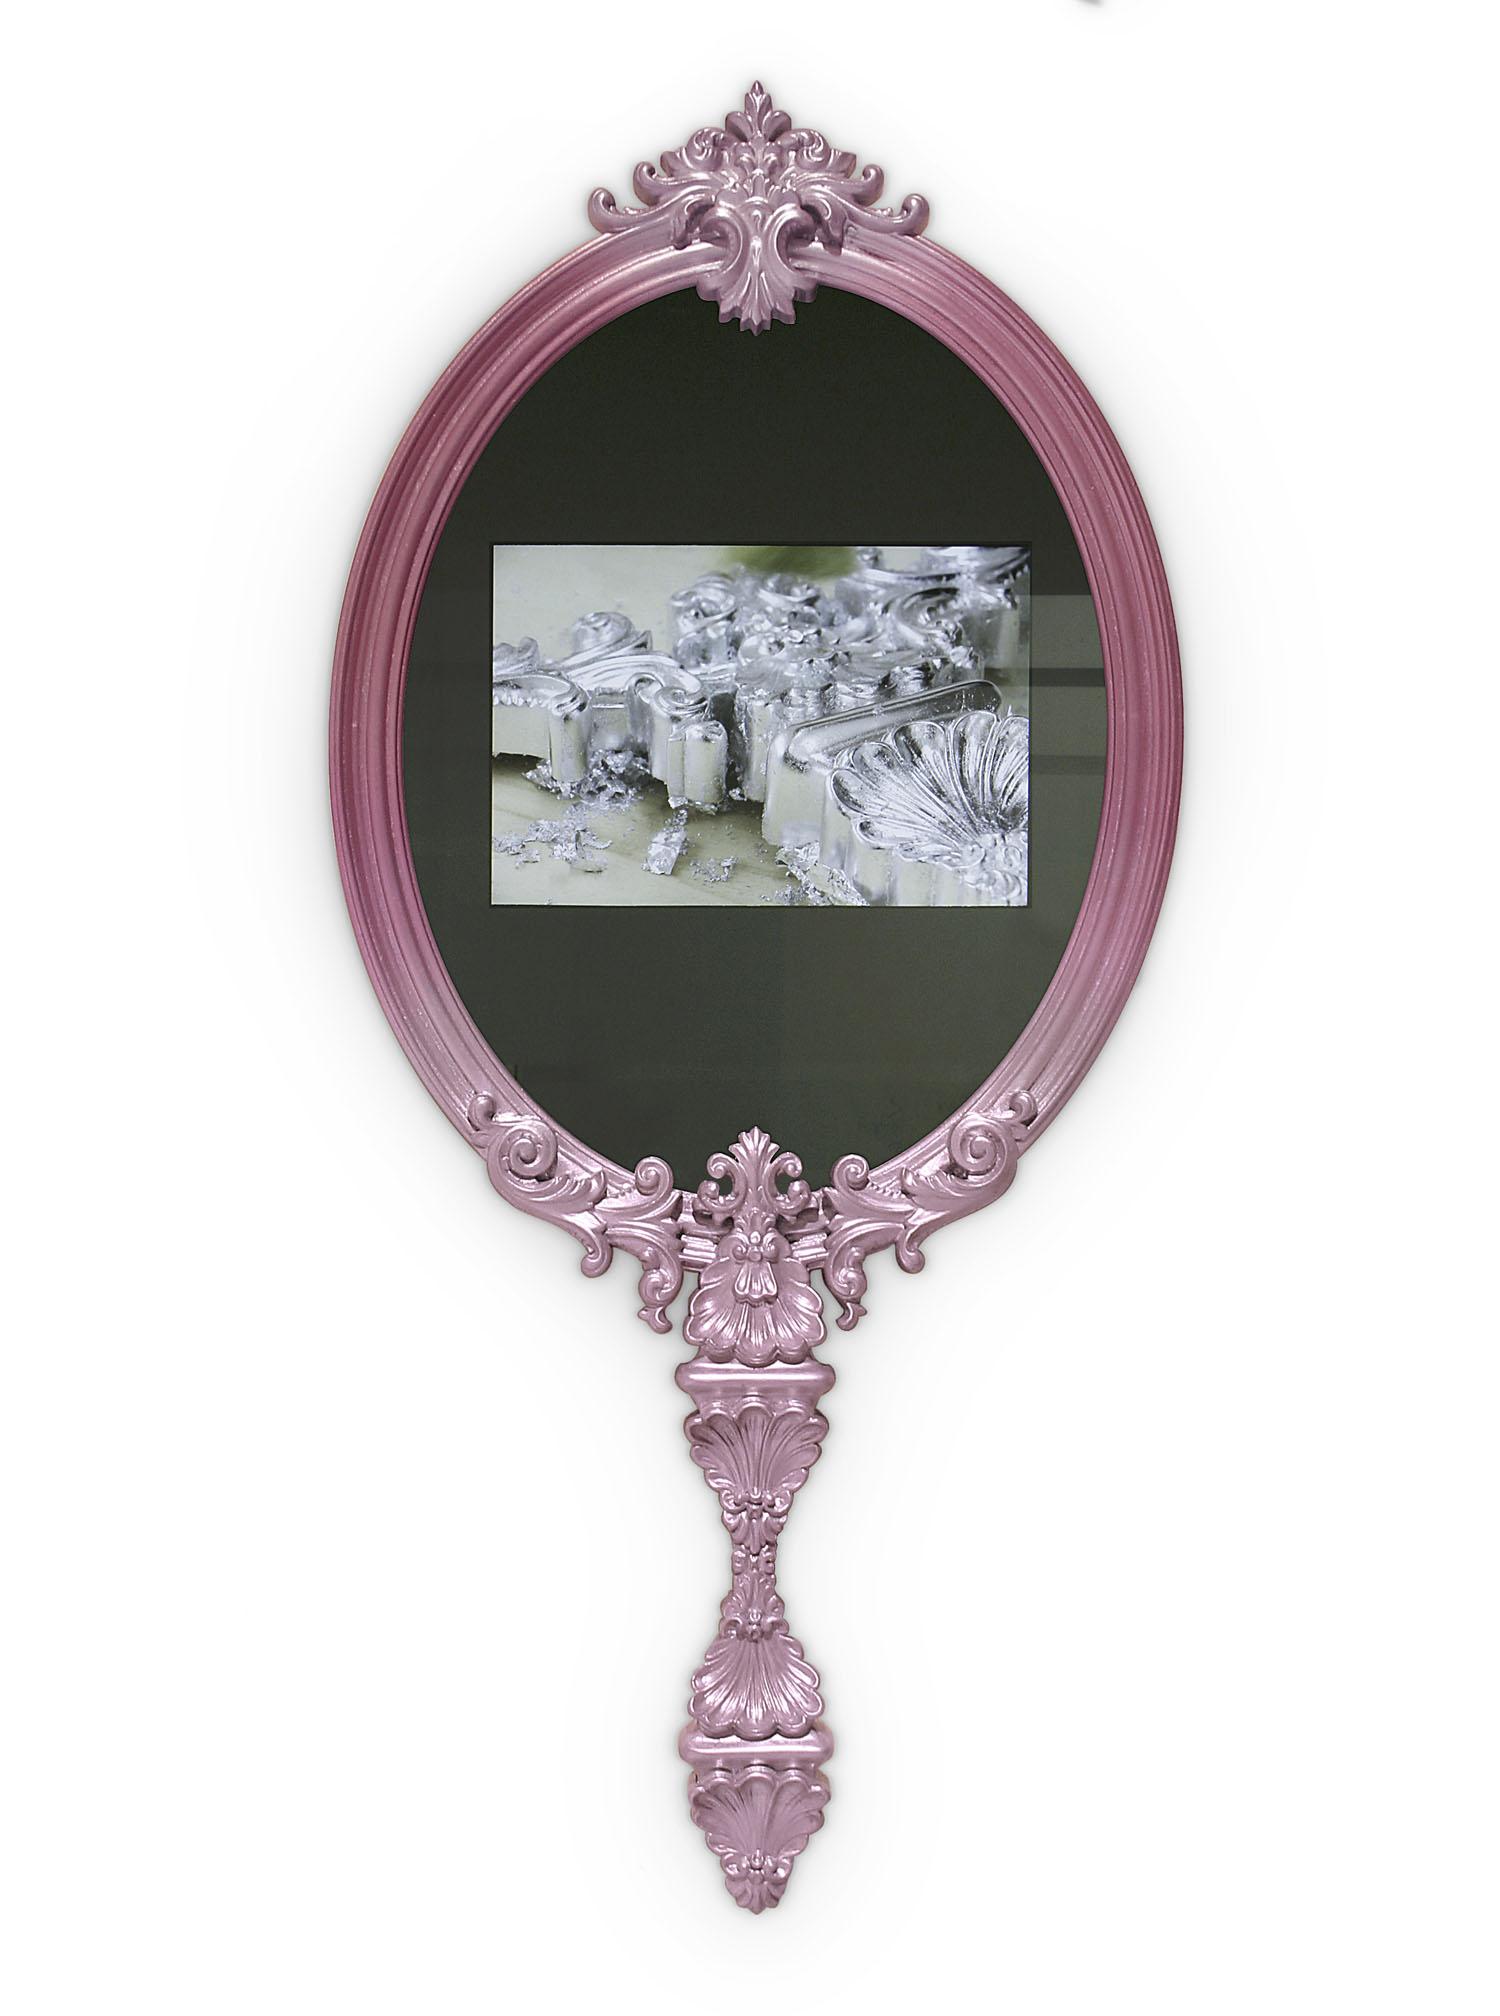 magical-mirror-detail-circu-magical-furniture-02